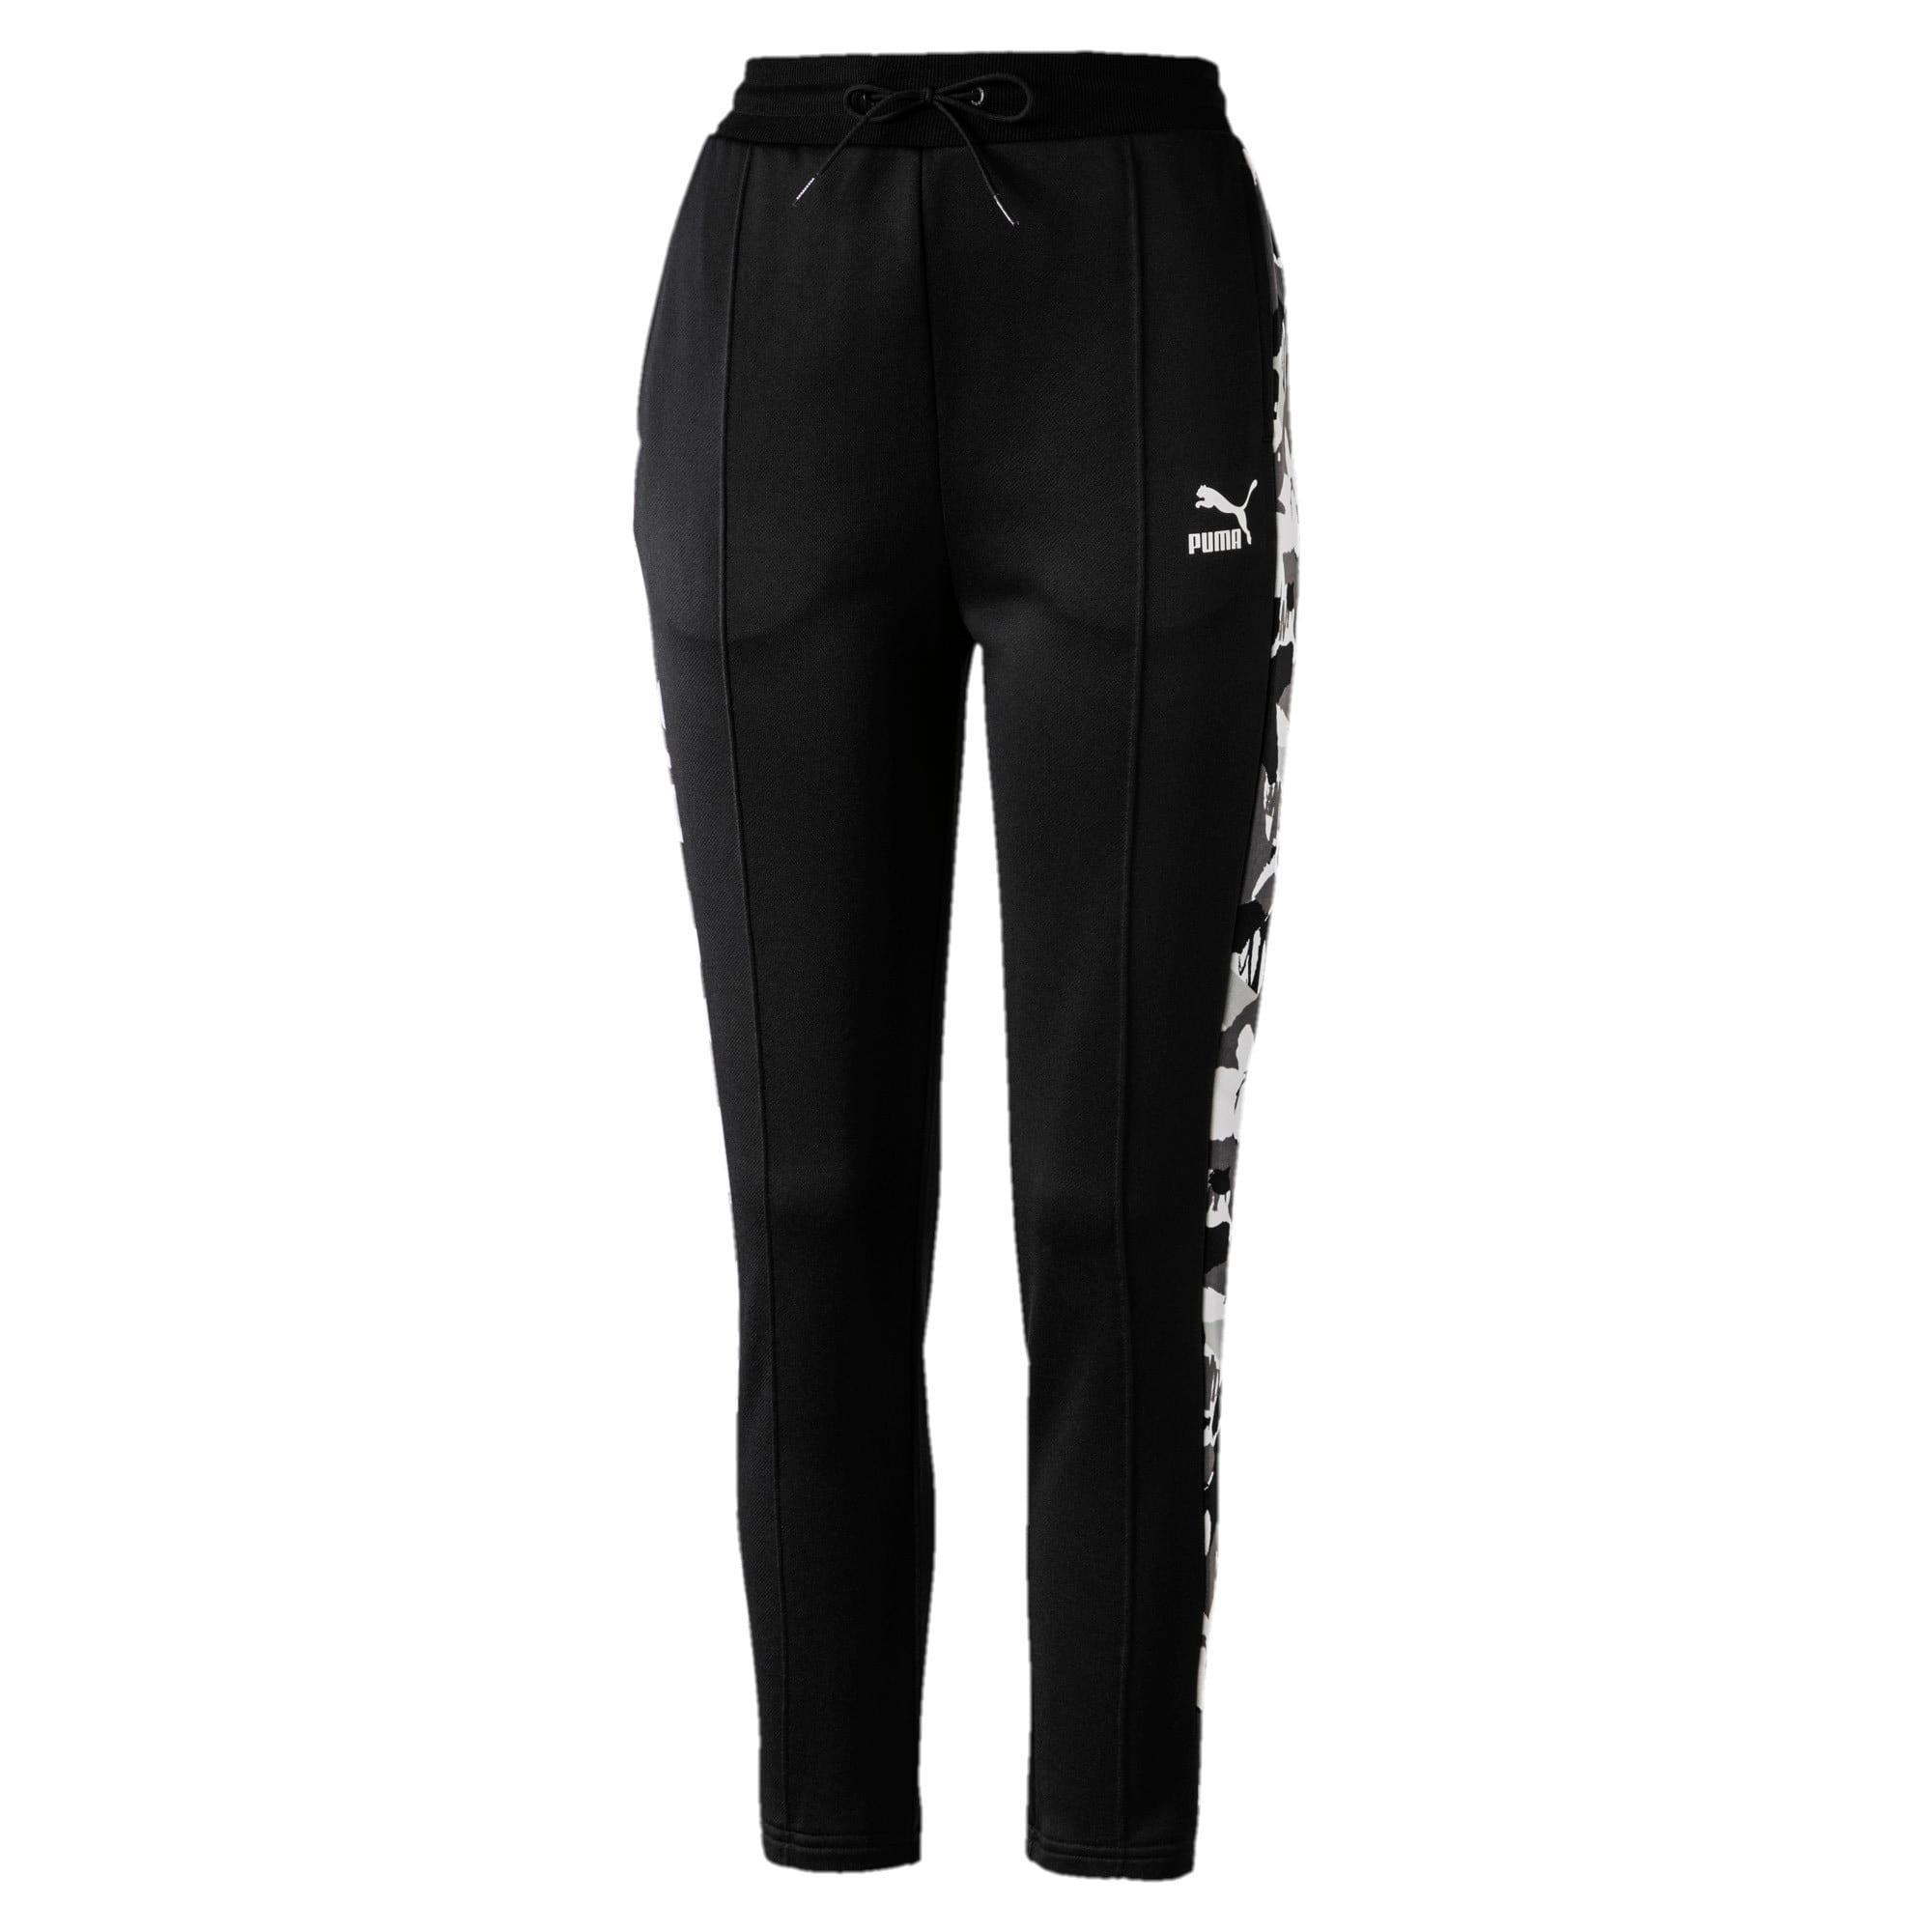 Miniatura 1 de Pantalones deportivos ClassicsAOP T7 para mujer, Puma Black, mediano